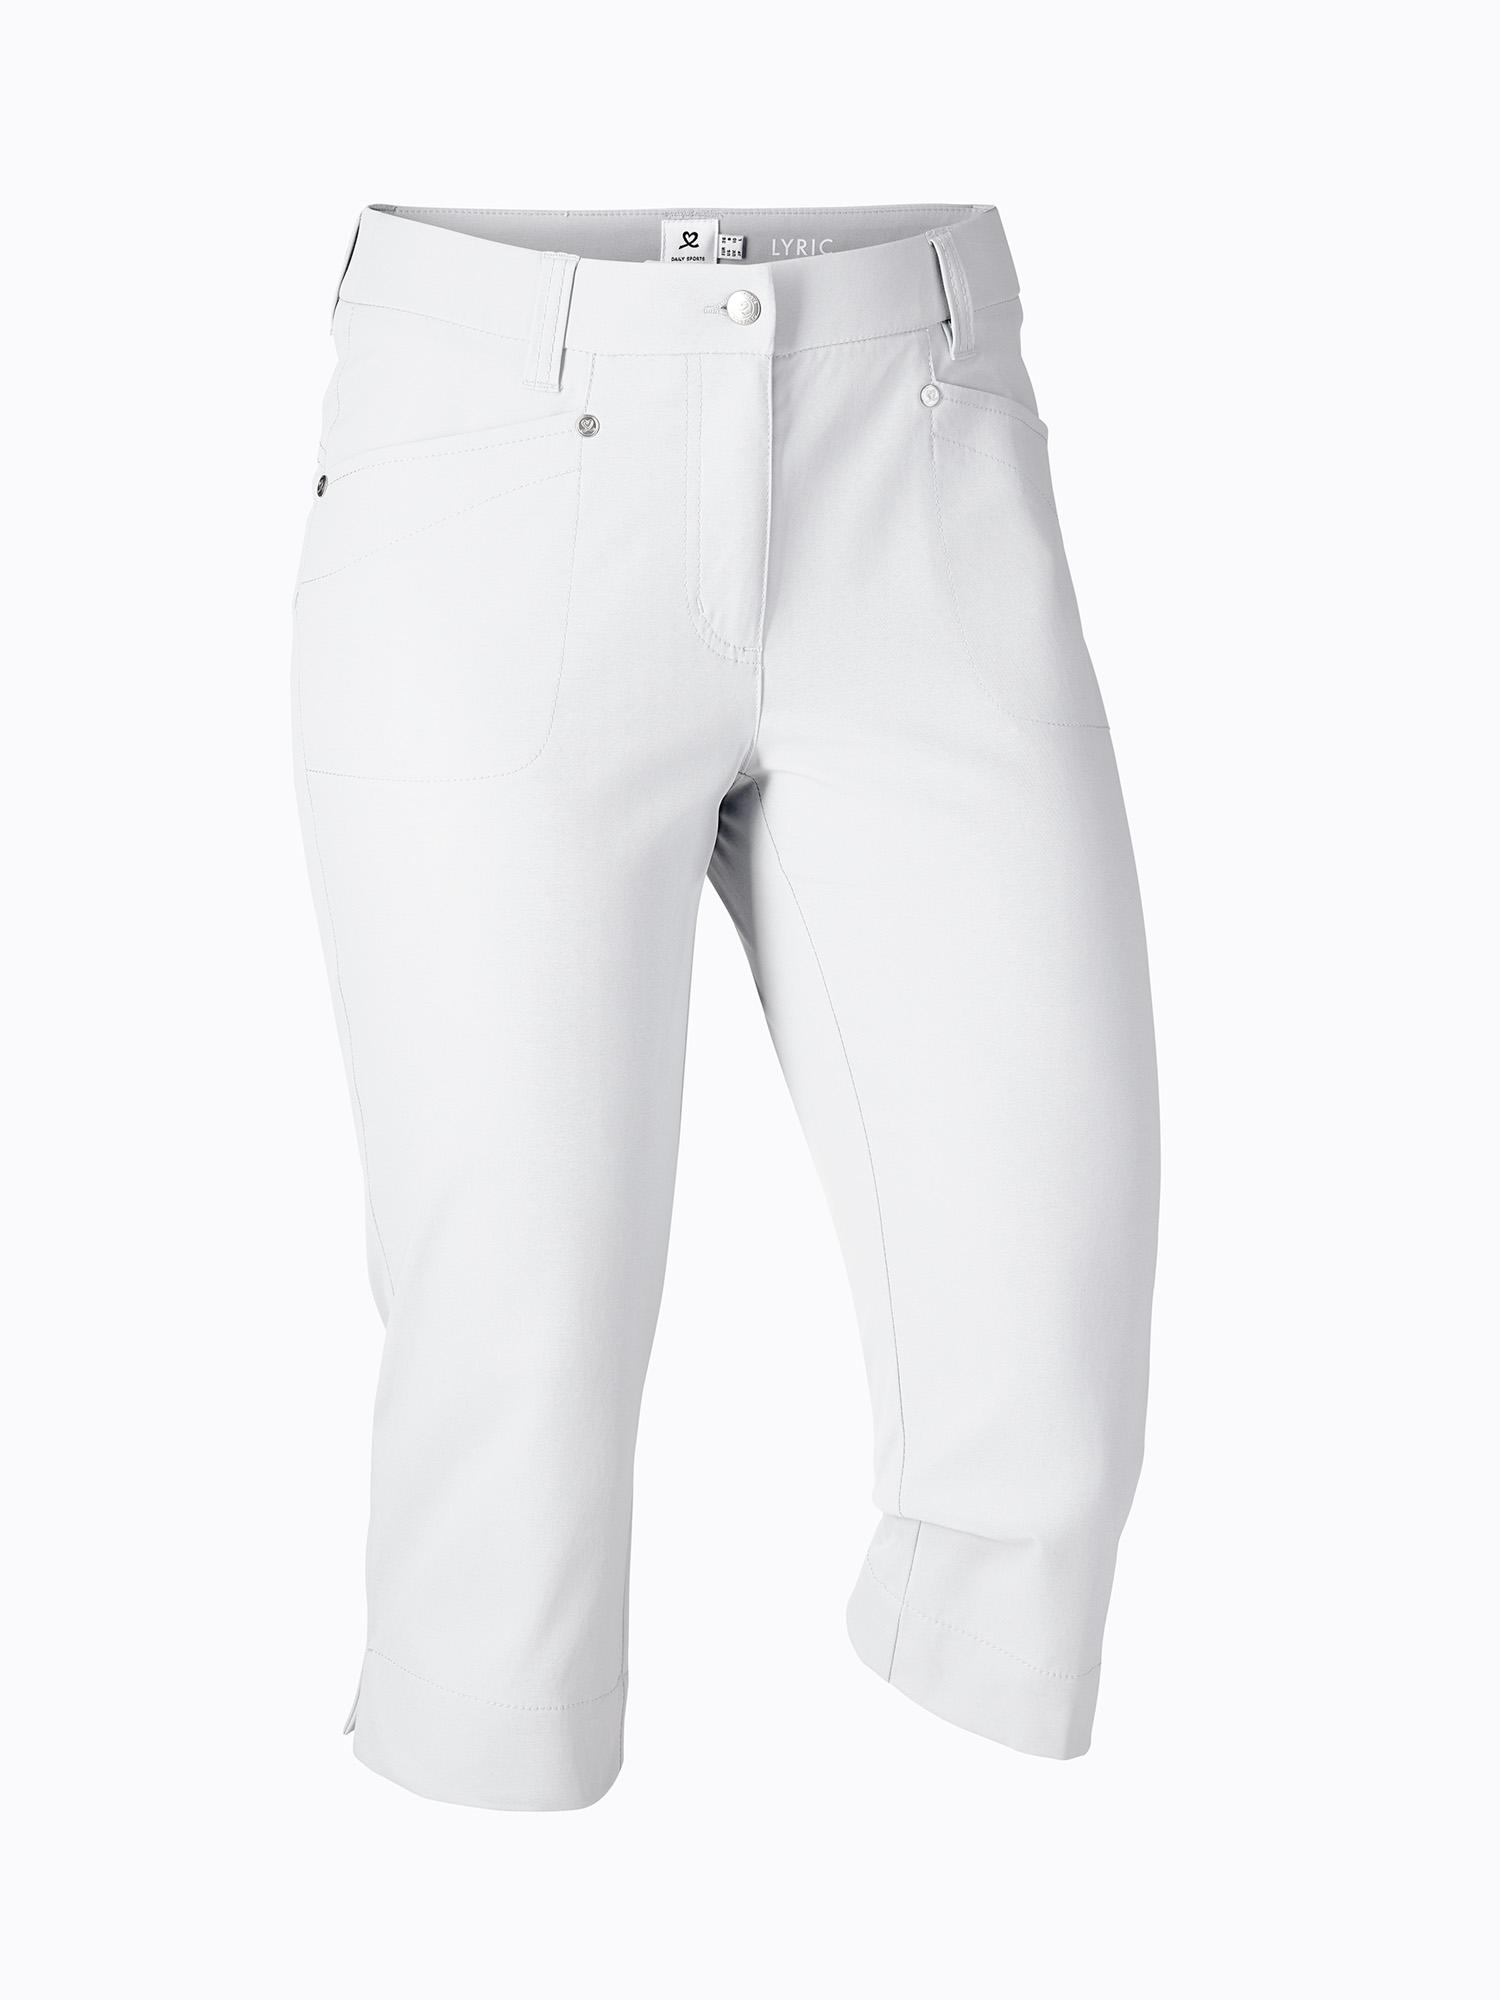 Lyric Capri Pants 74 cm